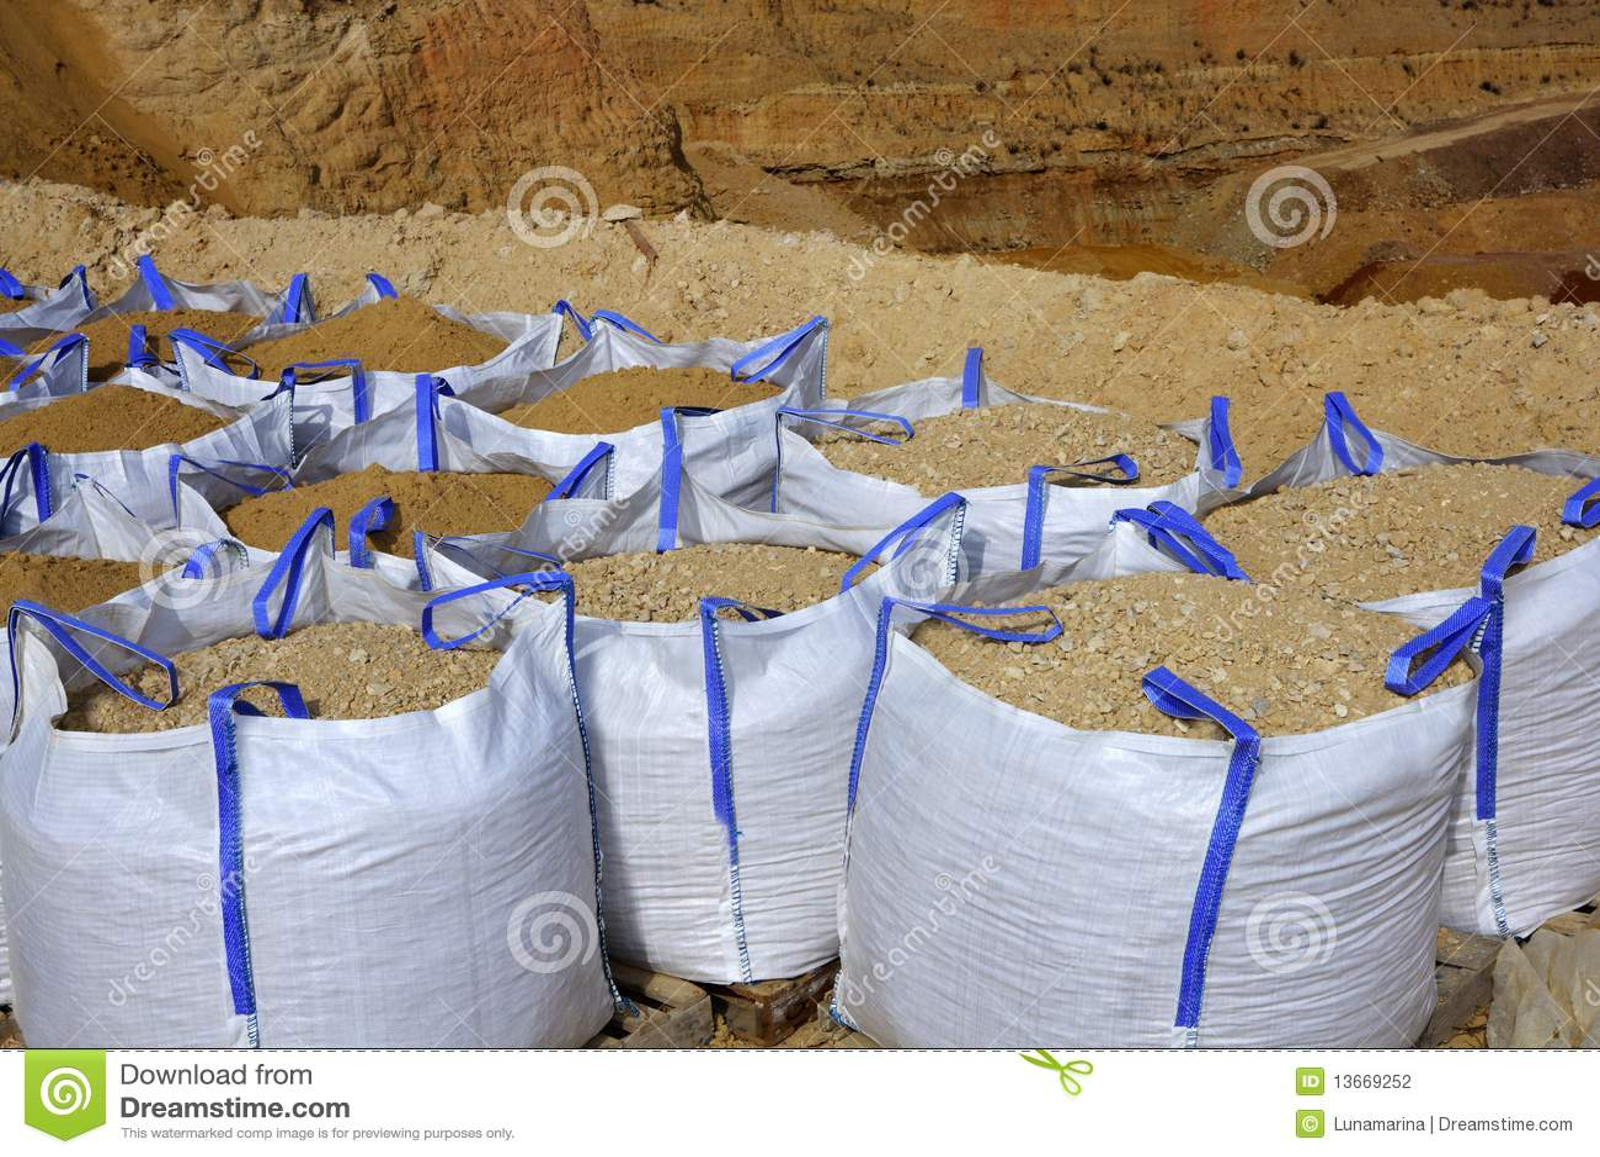 sandbag white big bag sand sacks quarry stock photography image 13669252. Black Bedroom Furniture Sets. Home Design Ideas